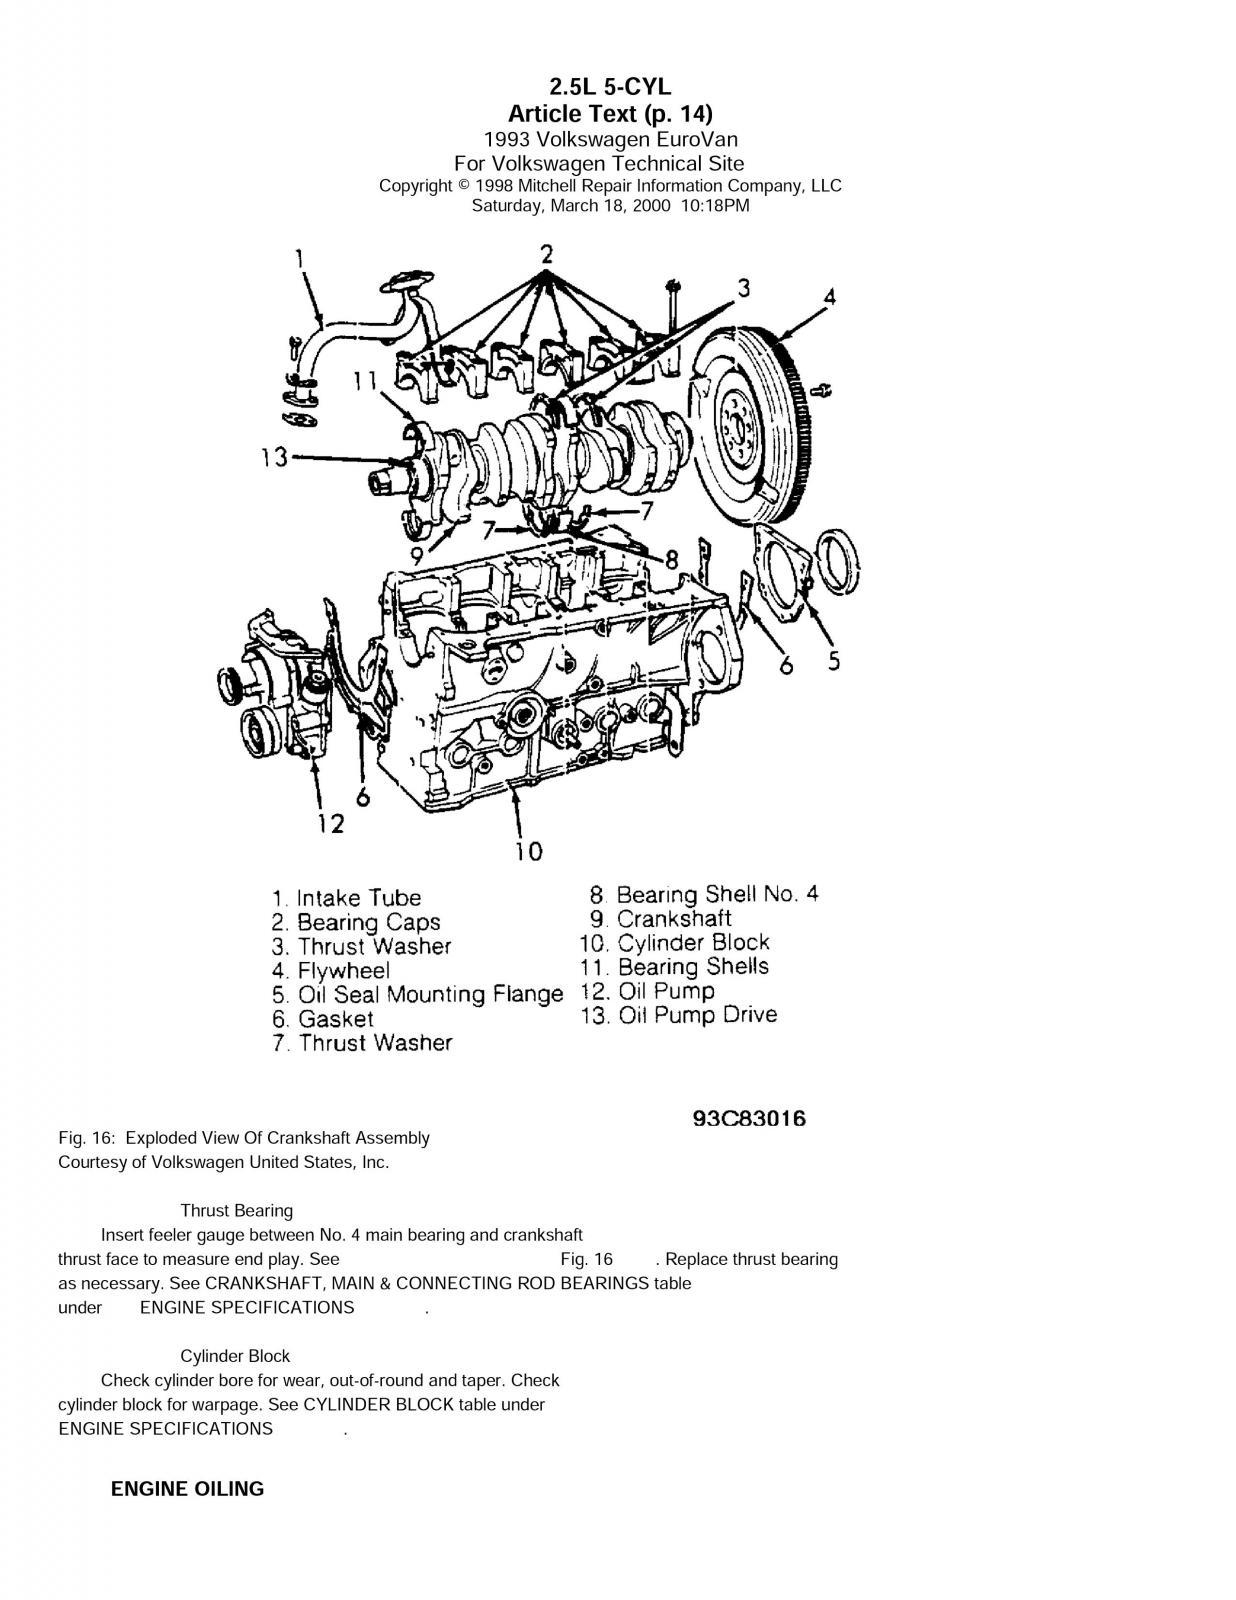 Eurovan 2.5l engine removal dissambly #2